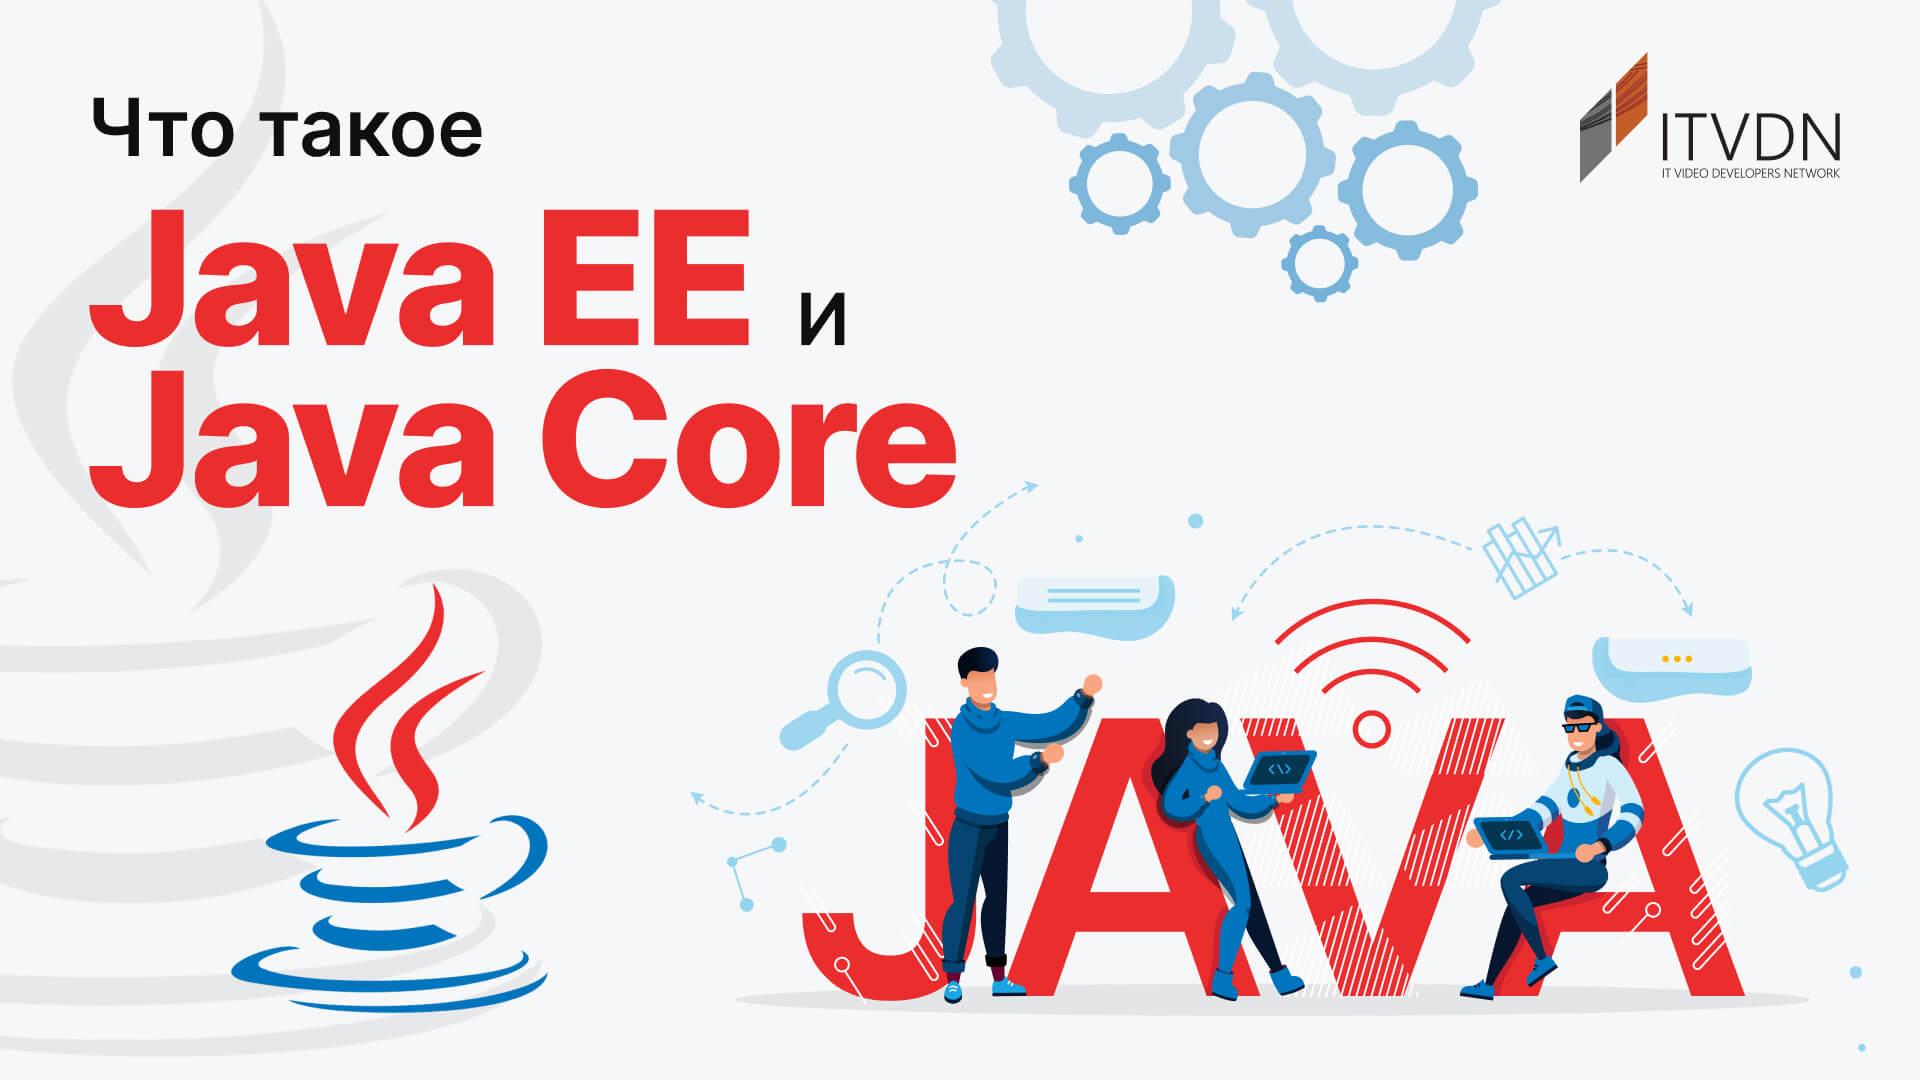 Обложка вебинара Что такое Java EE и Java Core